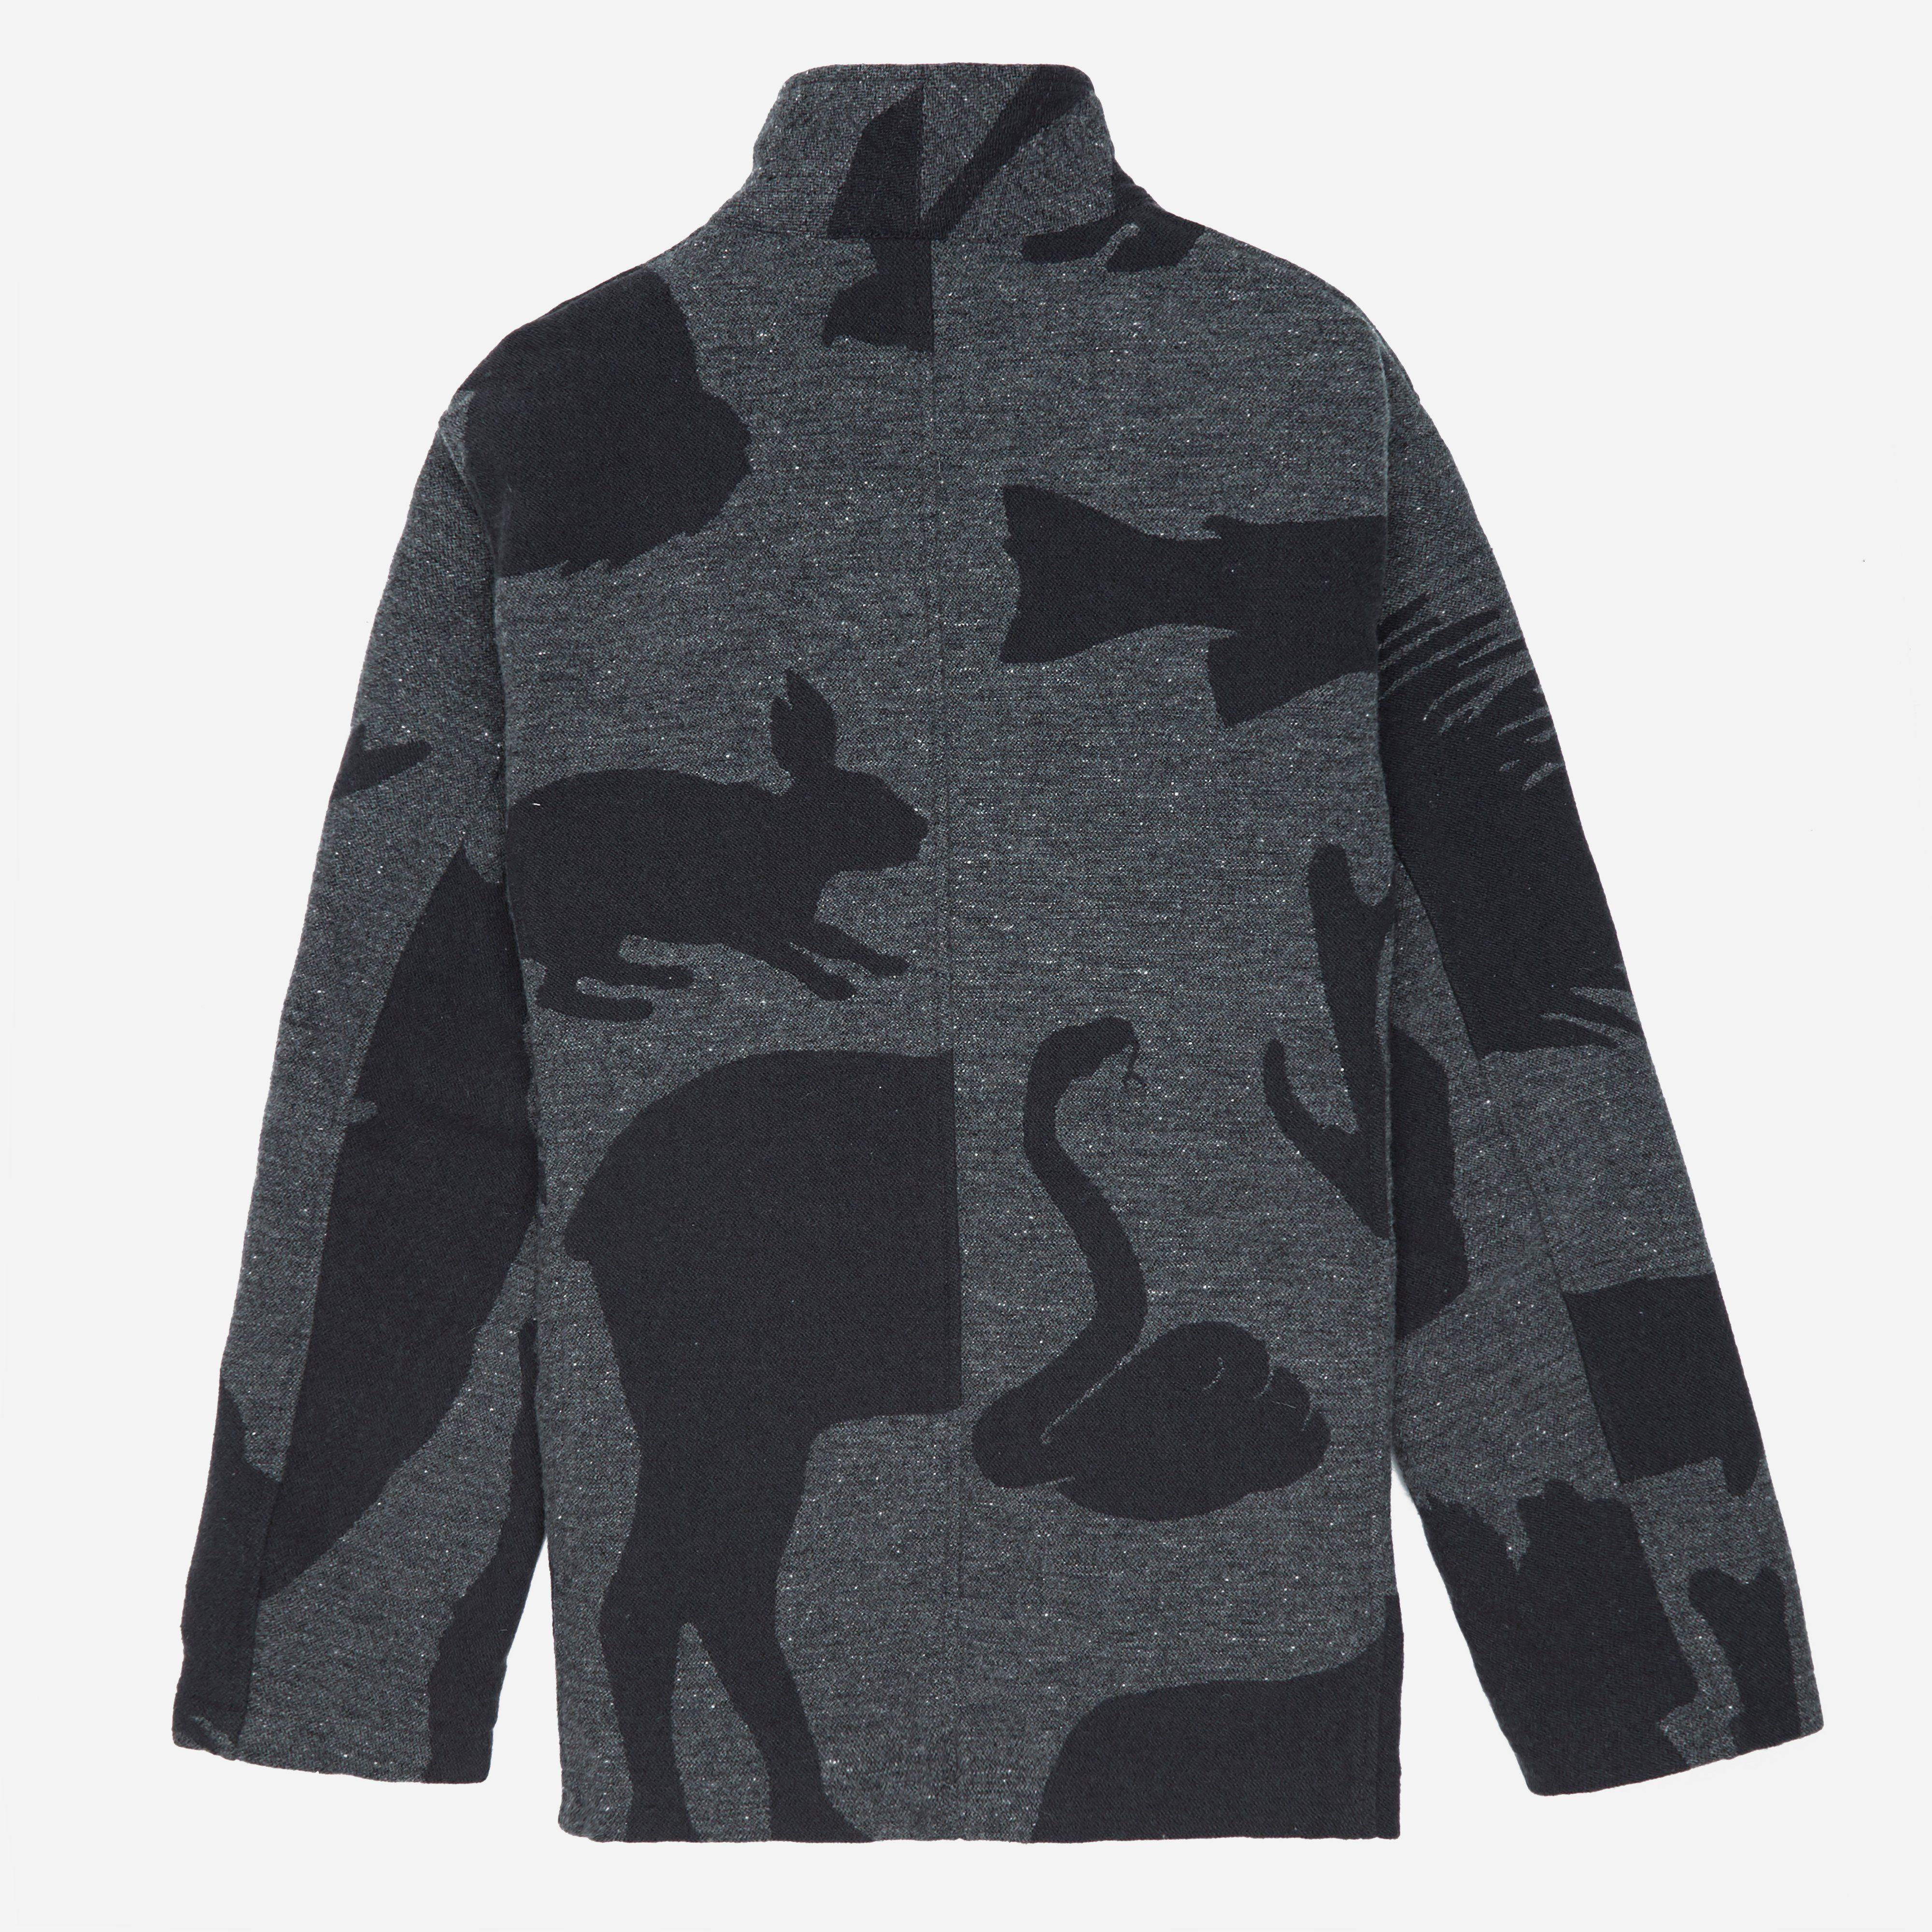 Engineered Garments Bedford Jacket - Animal Wool Jacquard